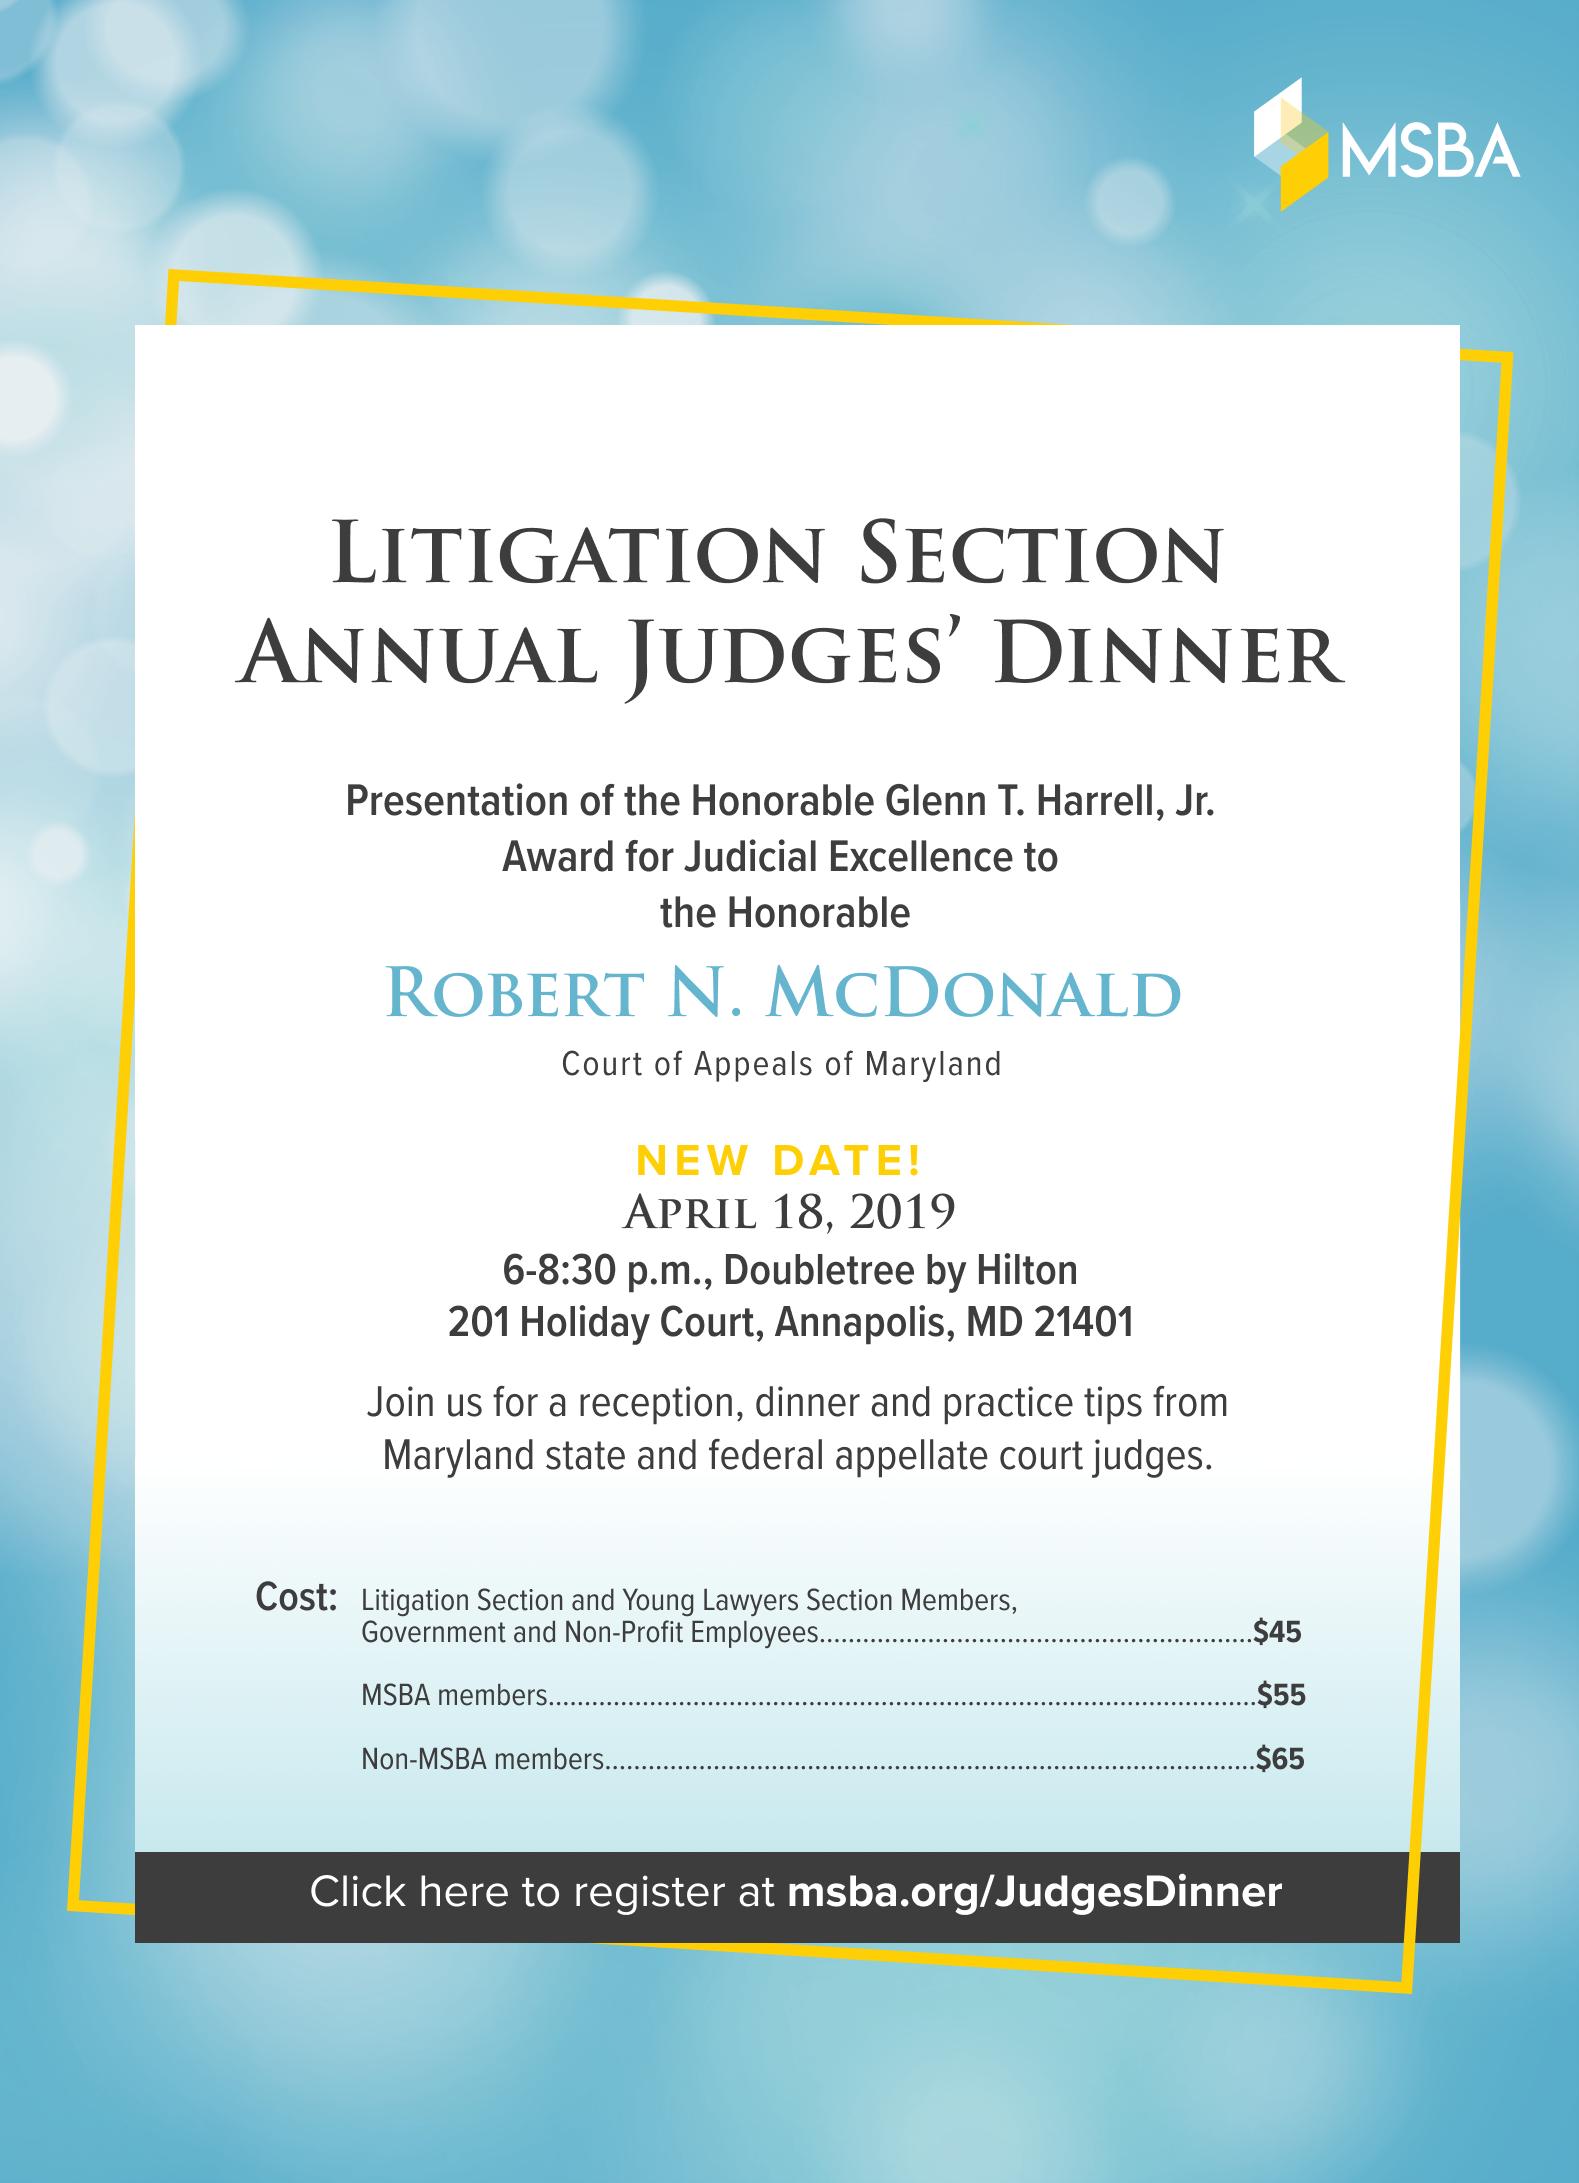 Annual Judges Dinner 2019